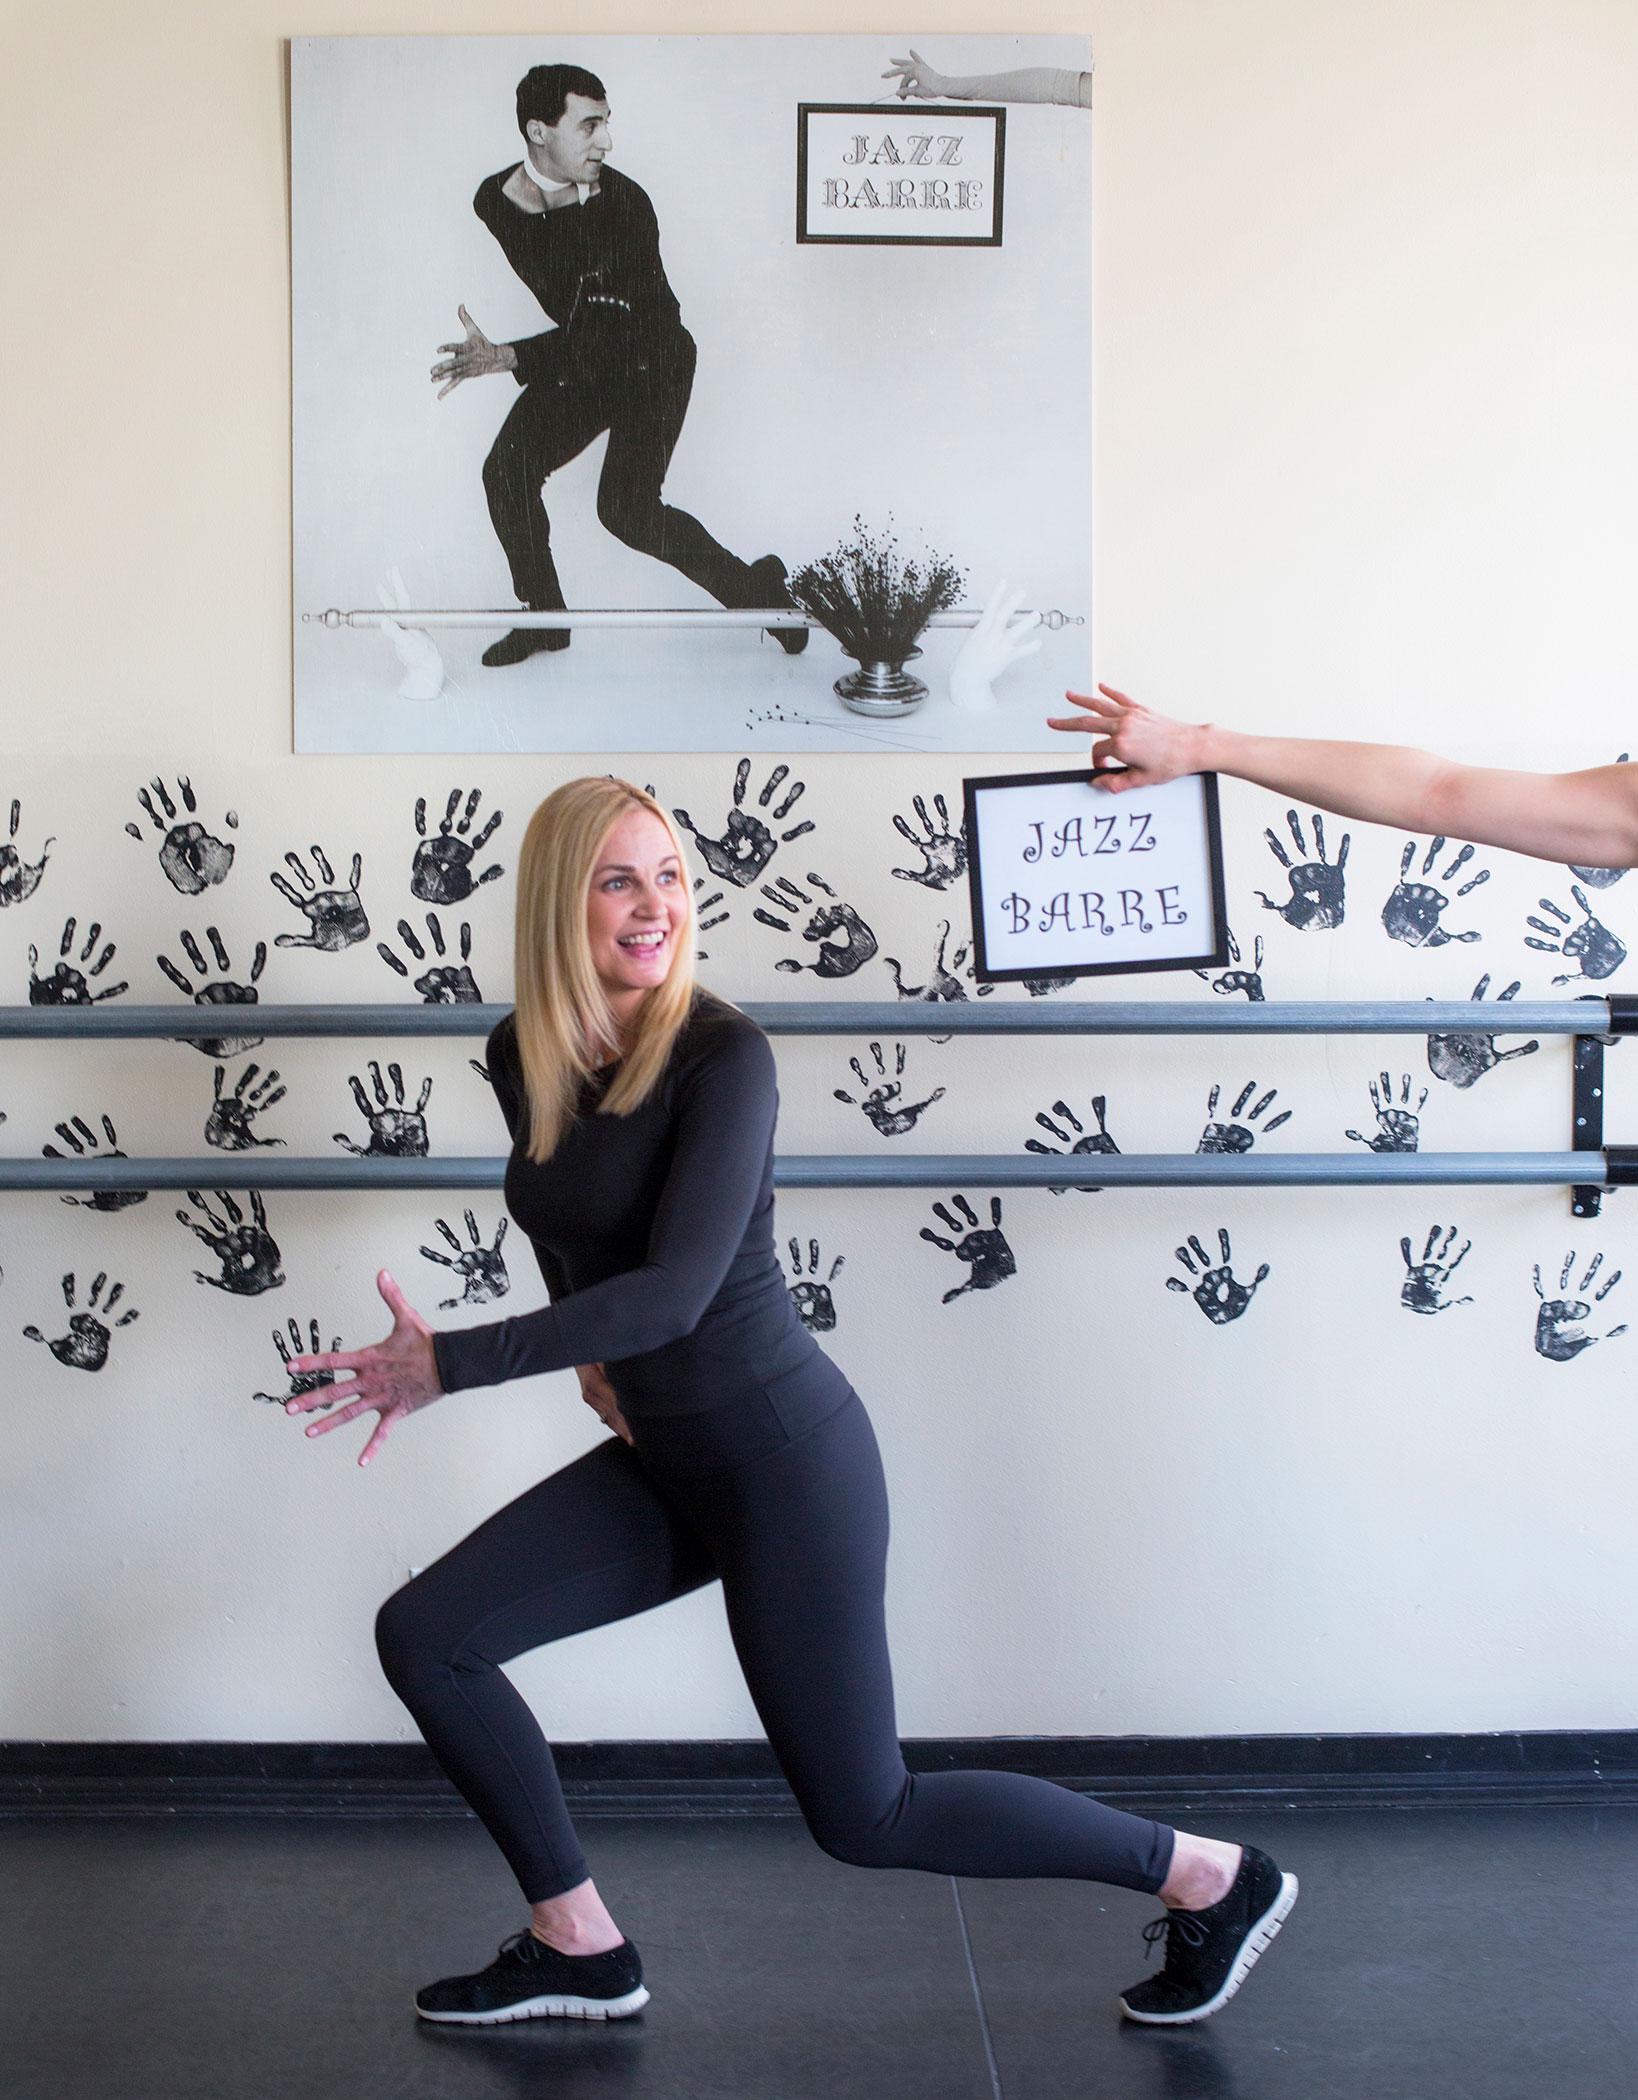 Gus Giordano Dance School Chicago Teacher Training